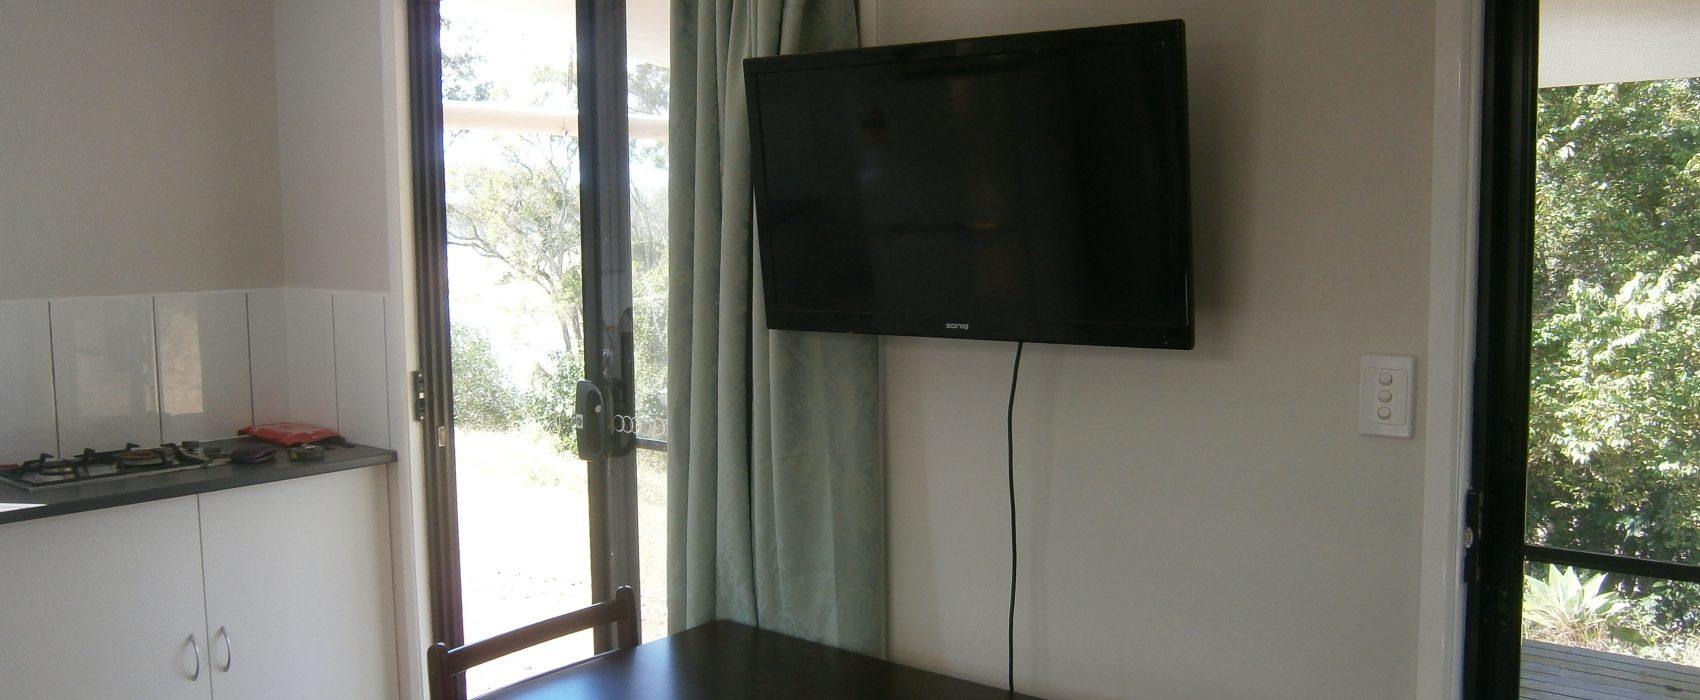 TV and Netflix